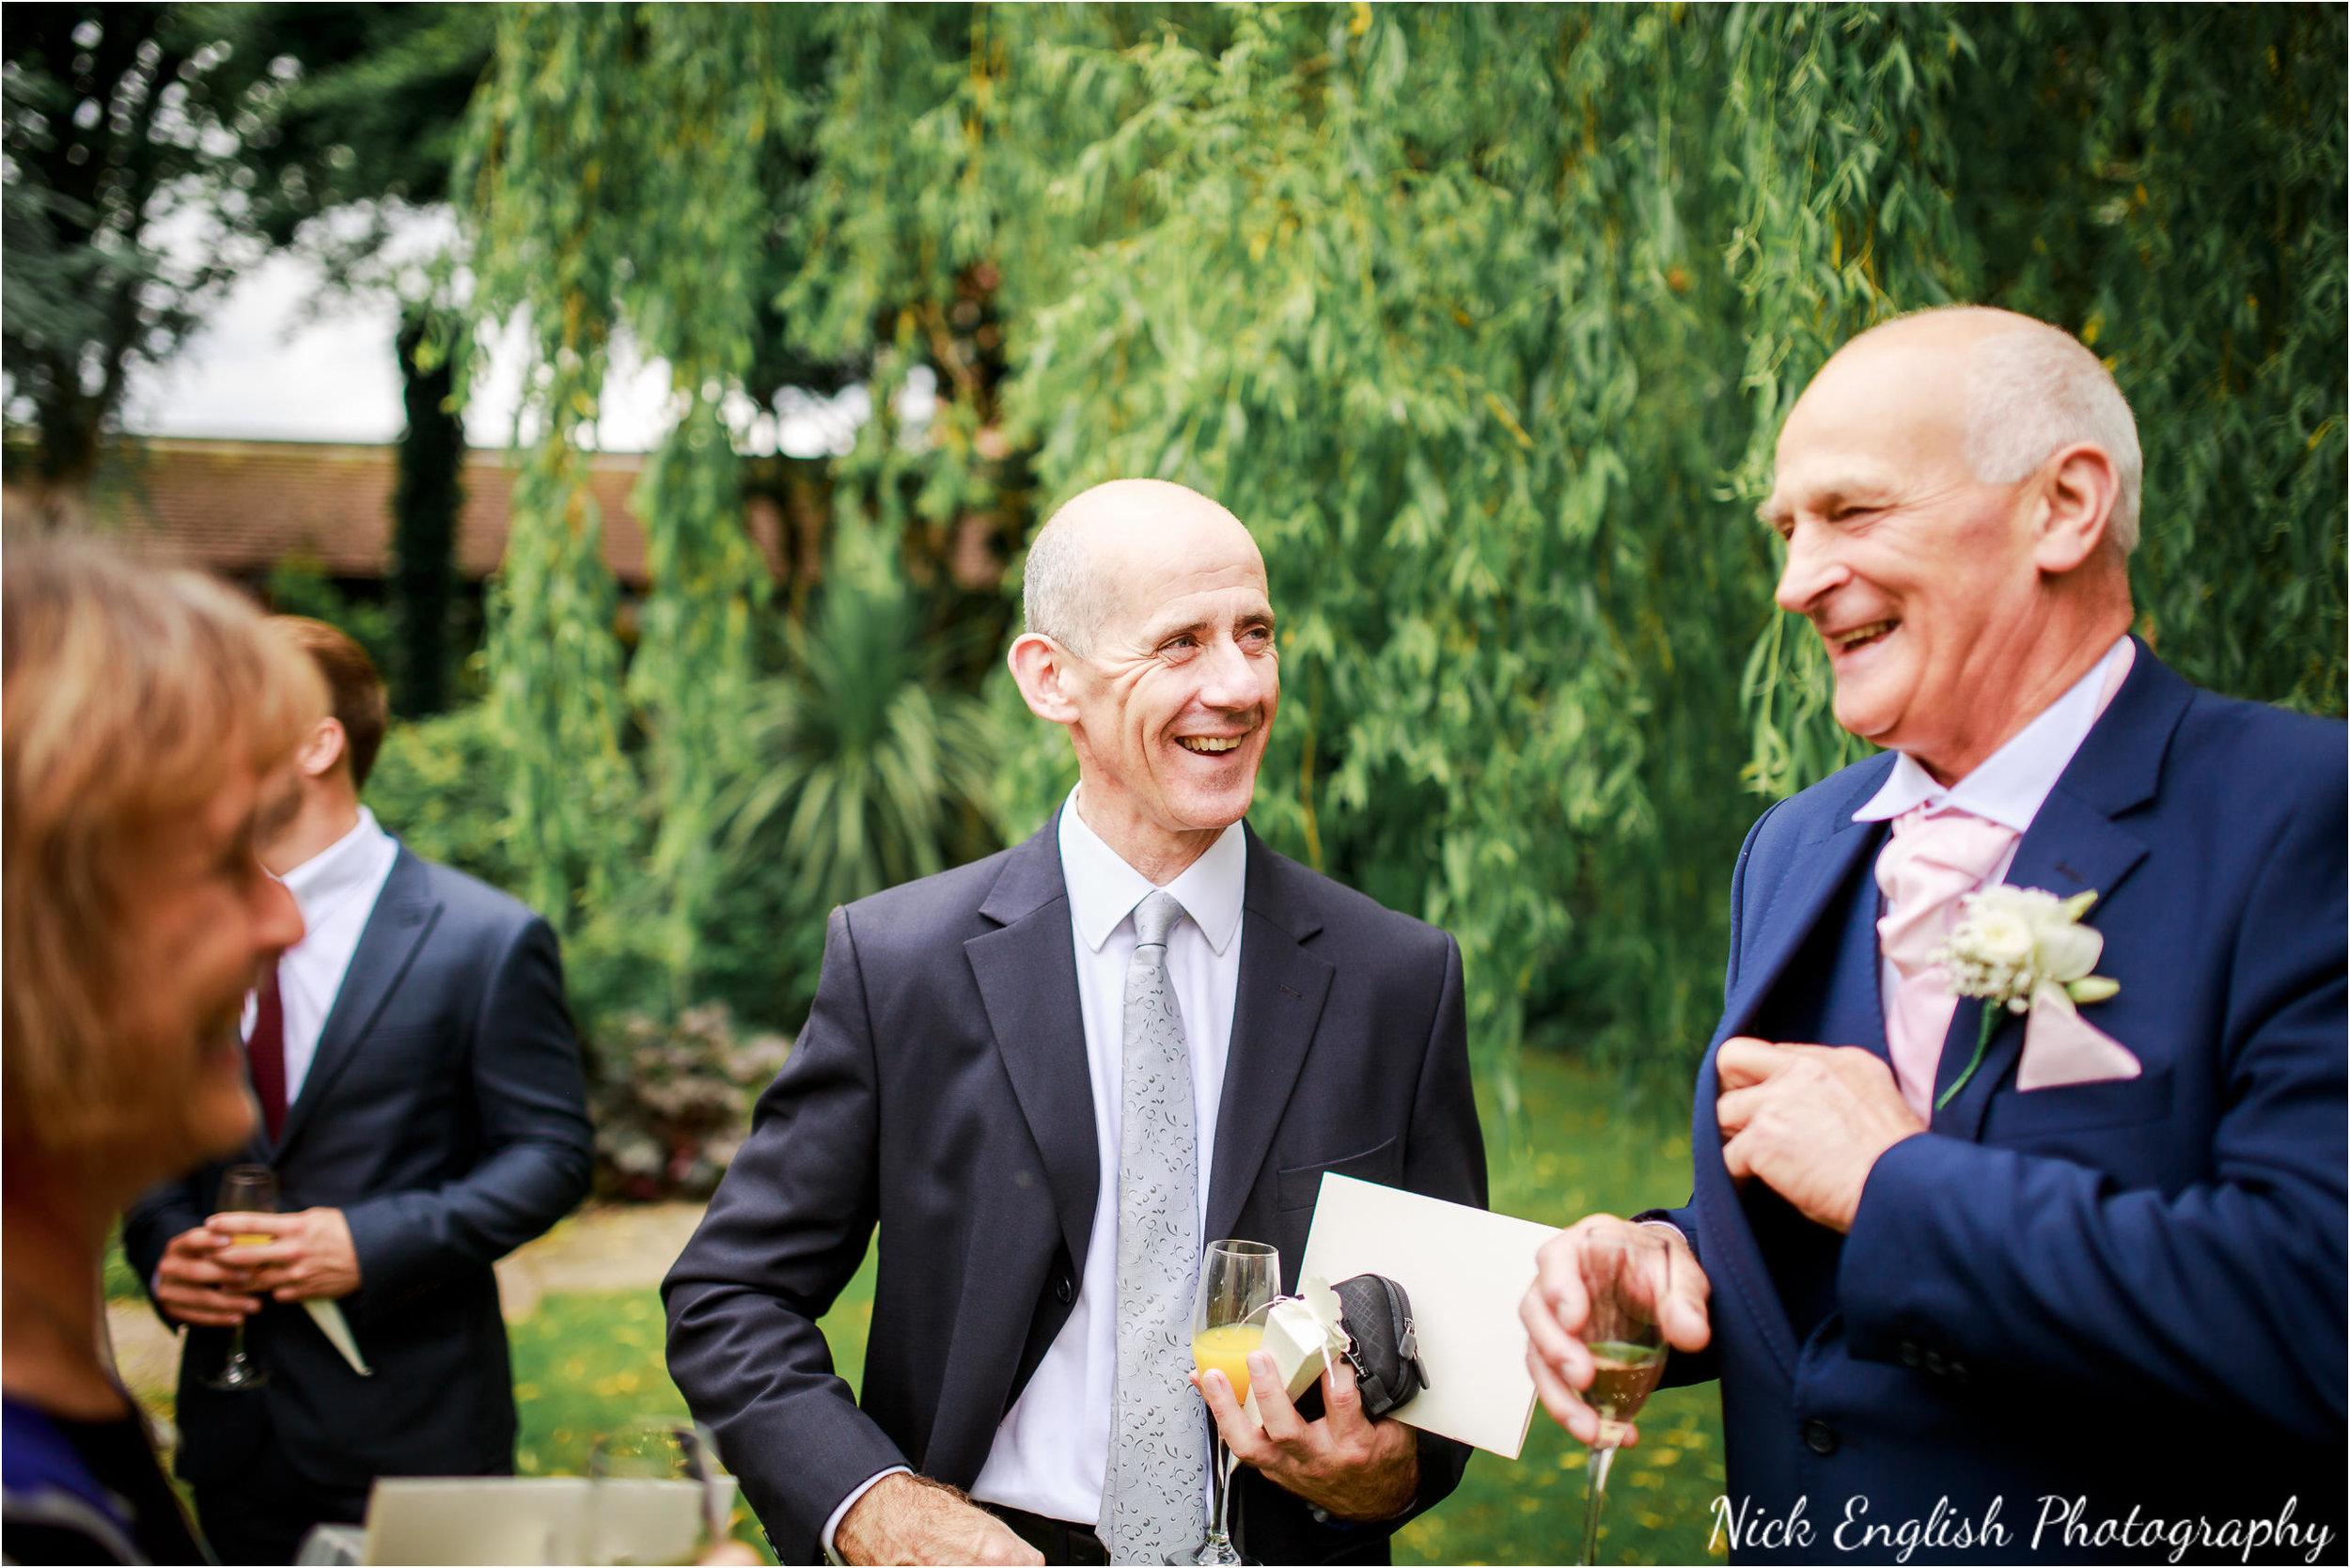 Emily David Wedding Photographs at Barton Grange Preston by Nick English Photography 116jpg.jpeg